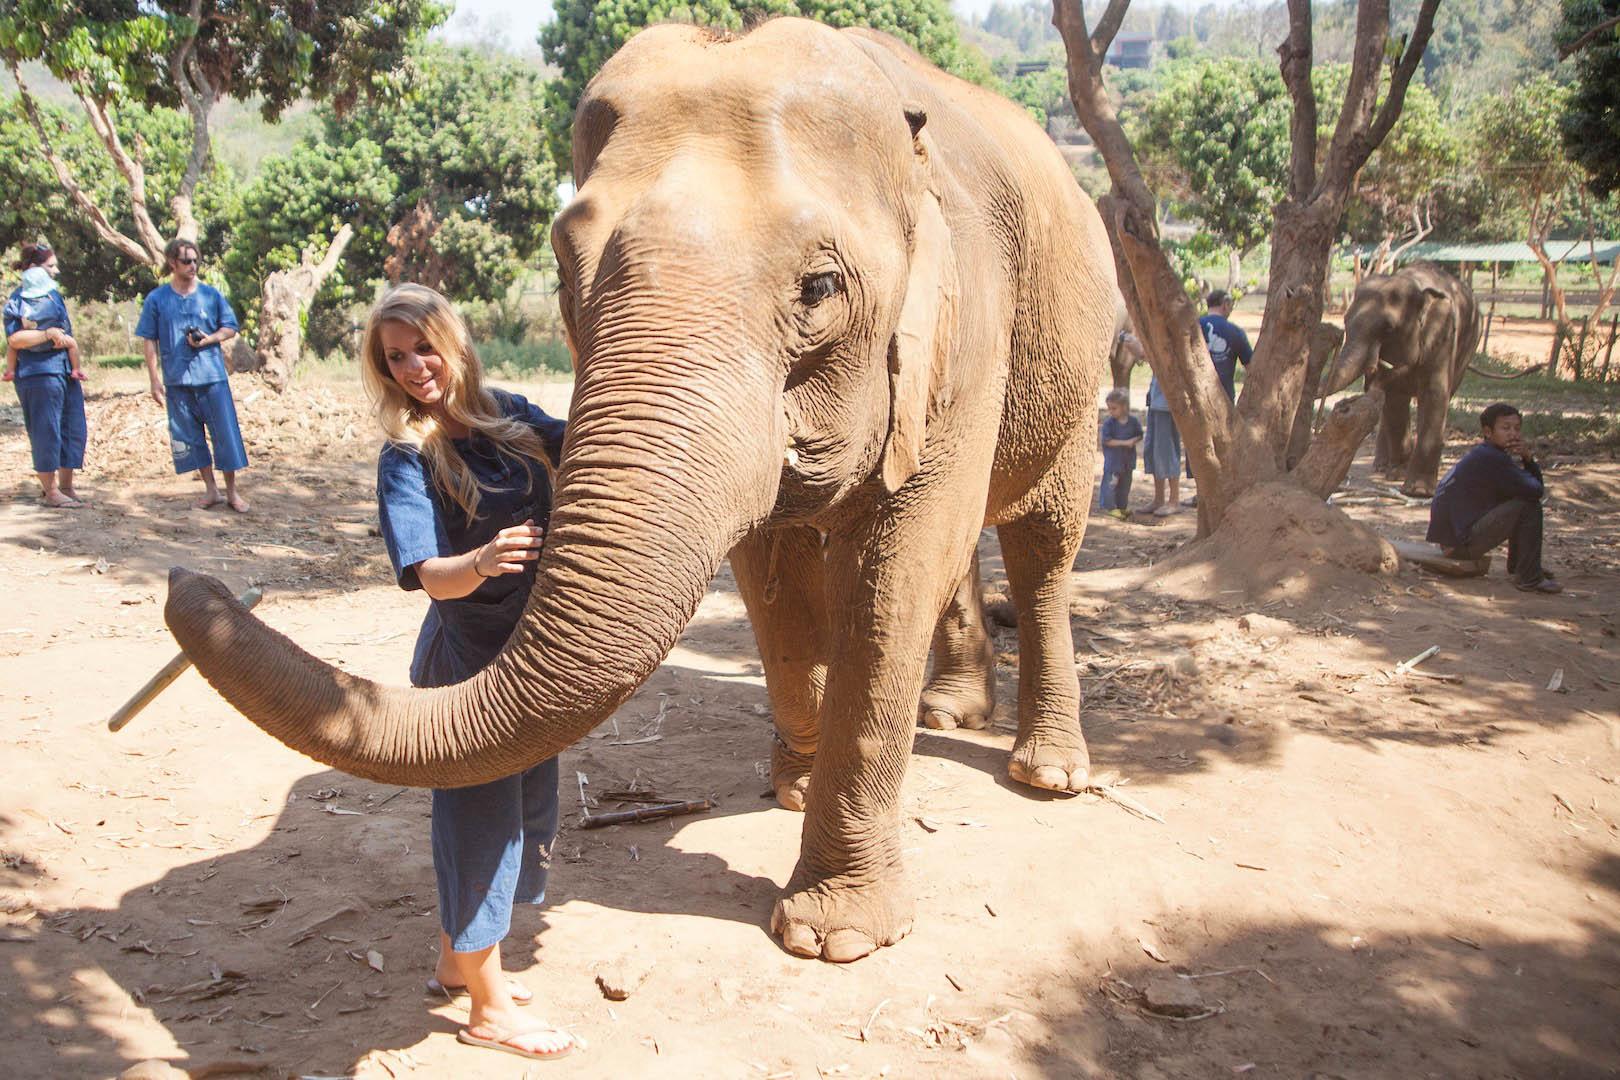 Baan Chang Elephant Park, Chiang Mai, Thailand